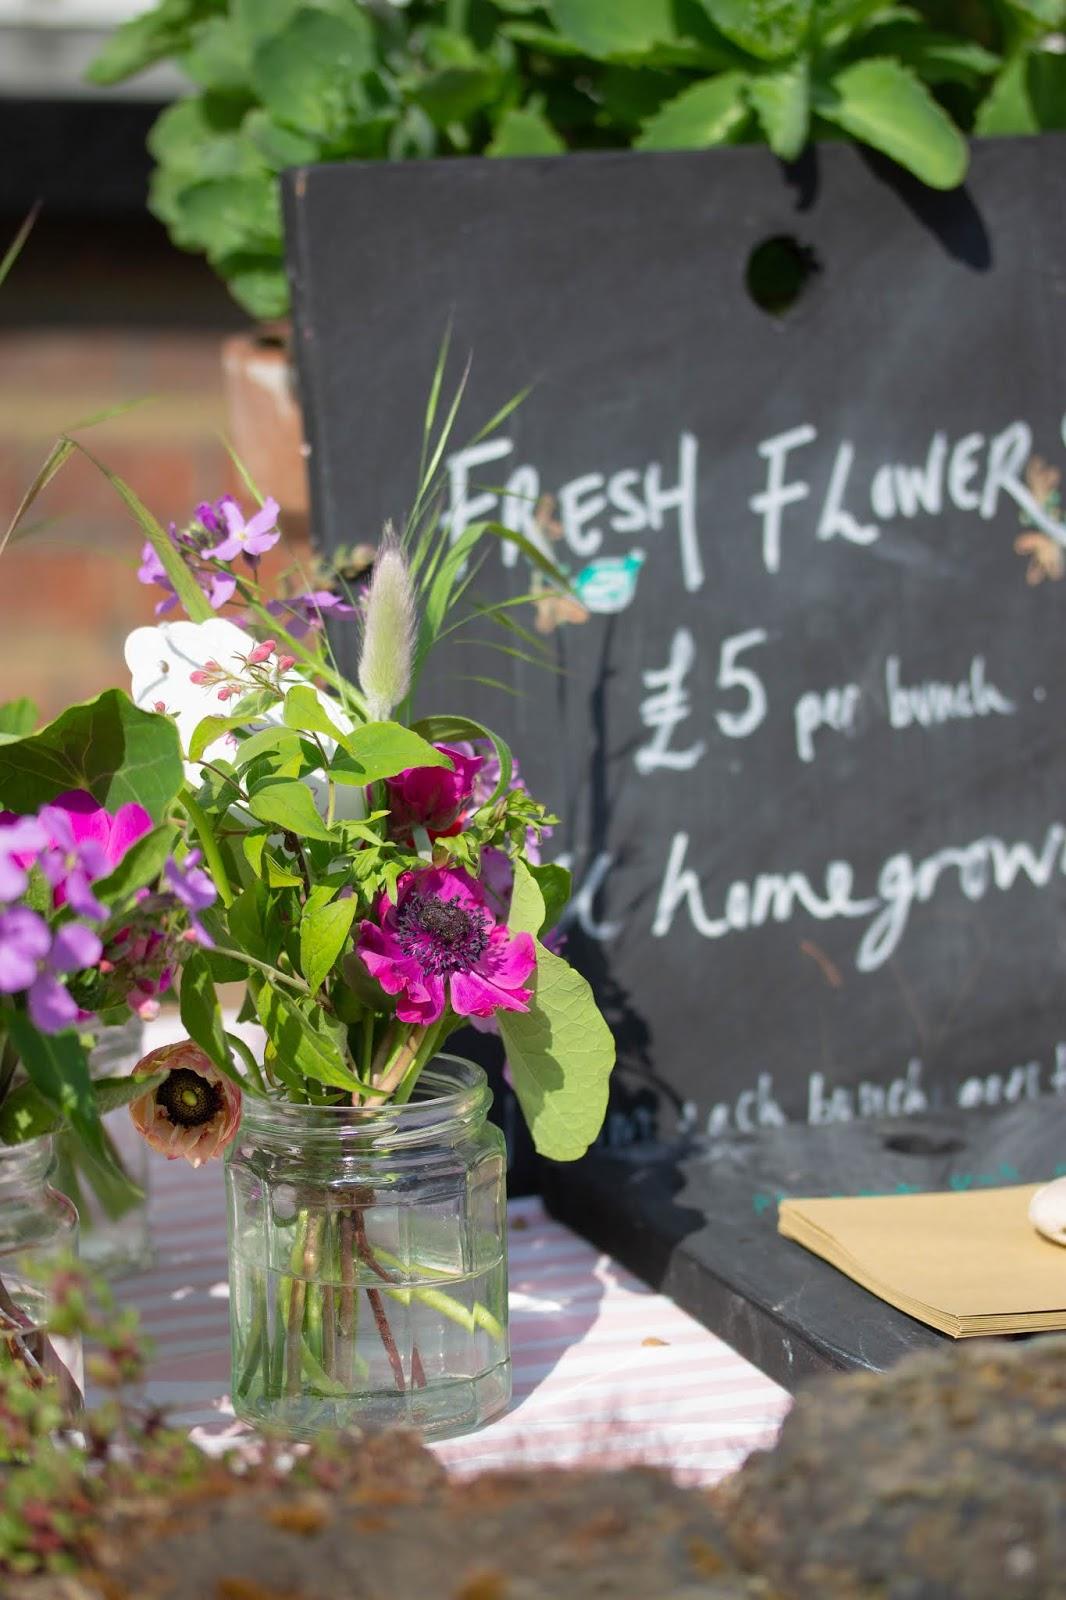 My flower stall